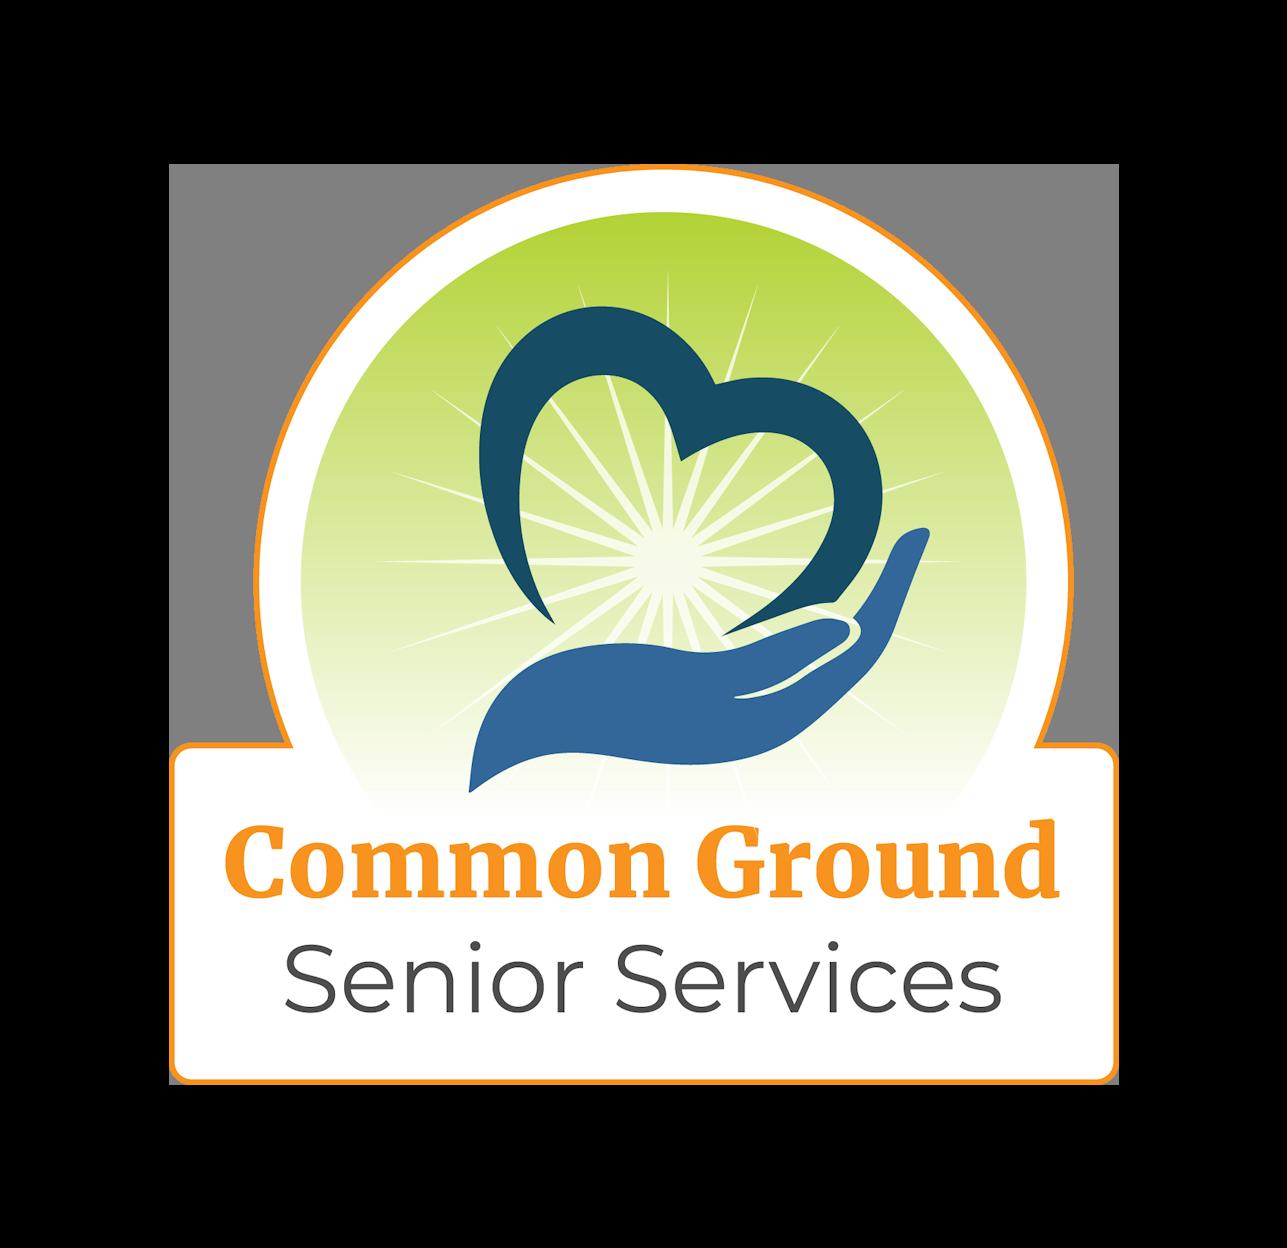 Common Ground Senior Services